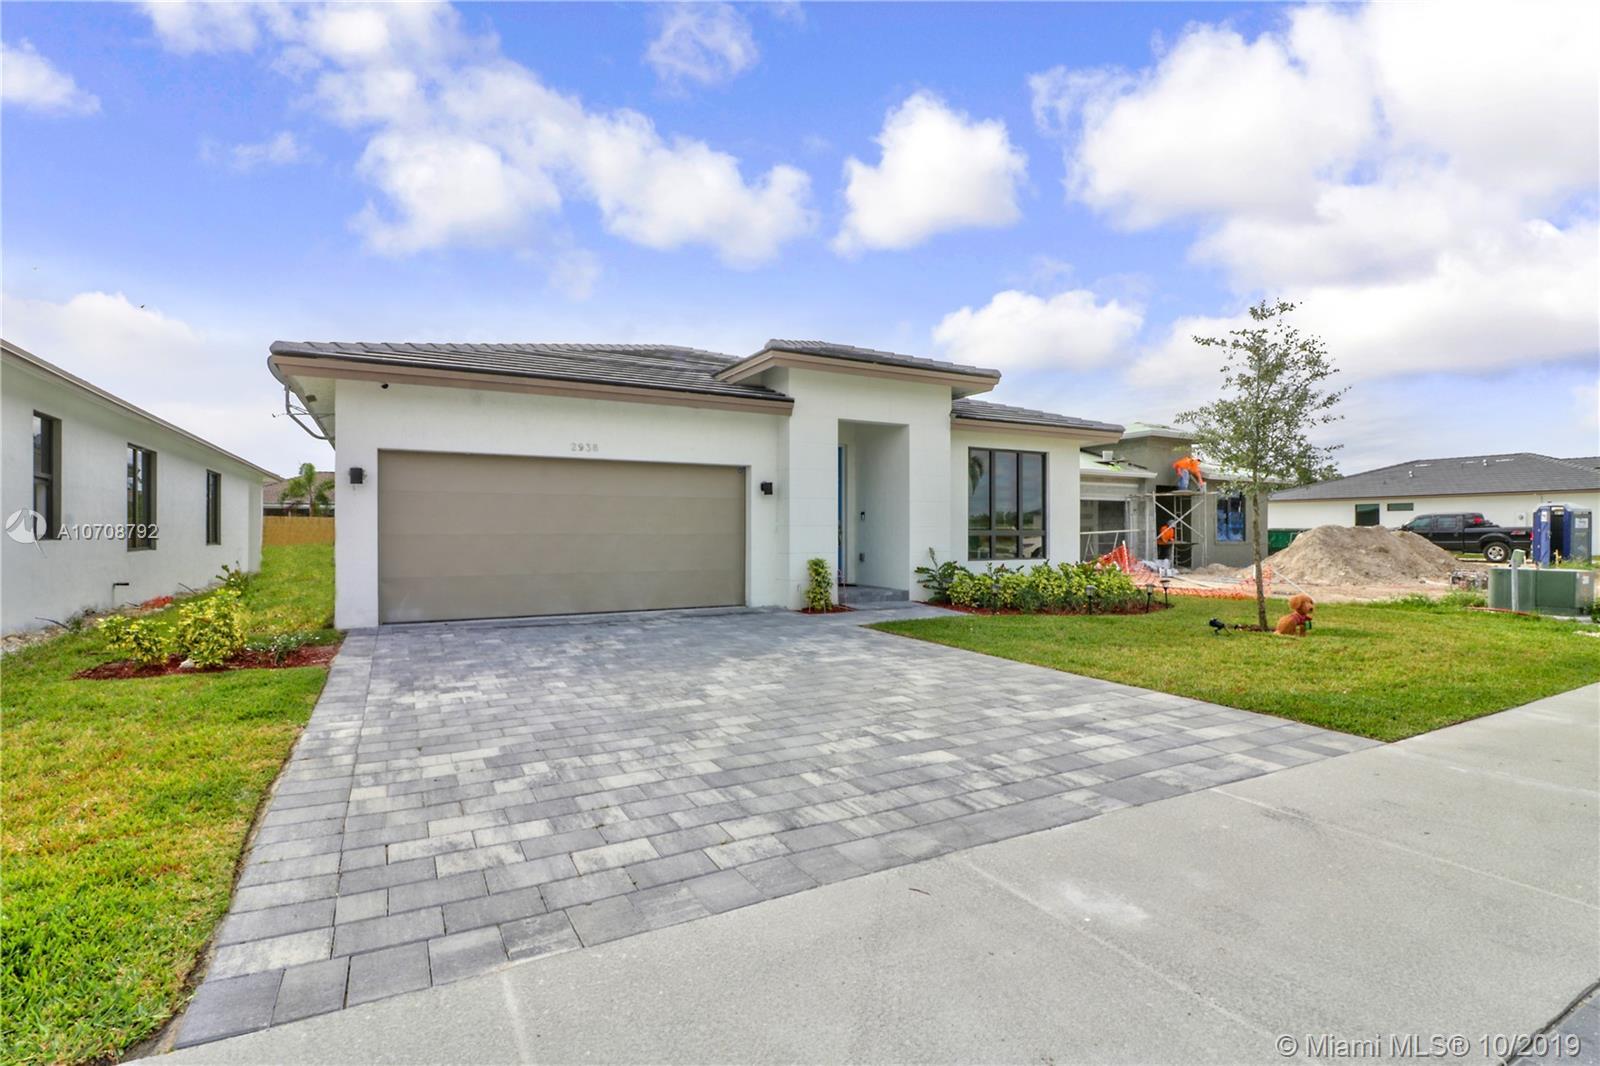 2938 SE 3rd St, Homestead, FL 33033 - Homestead, FL real estate listing